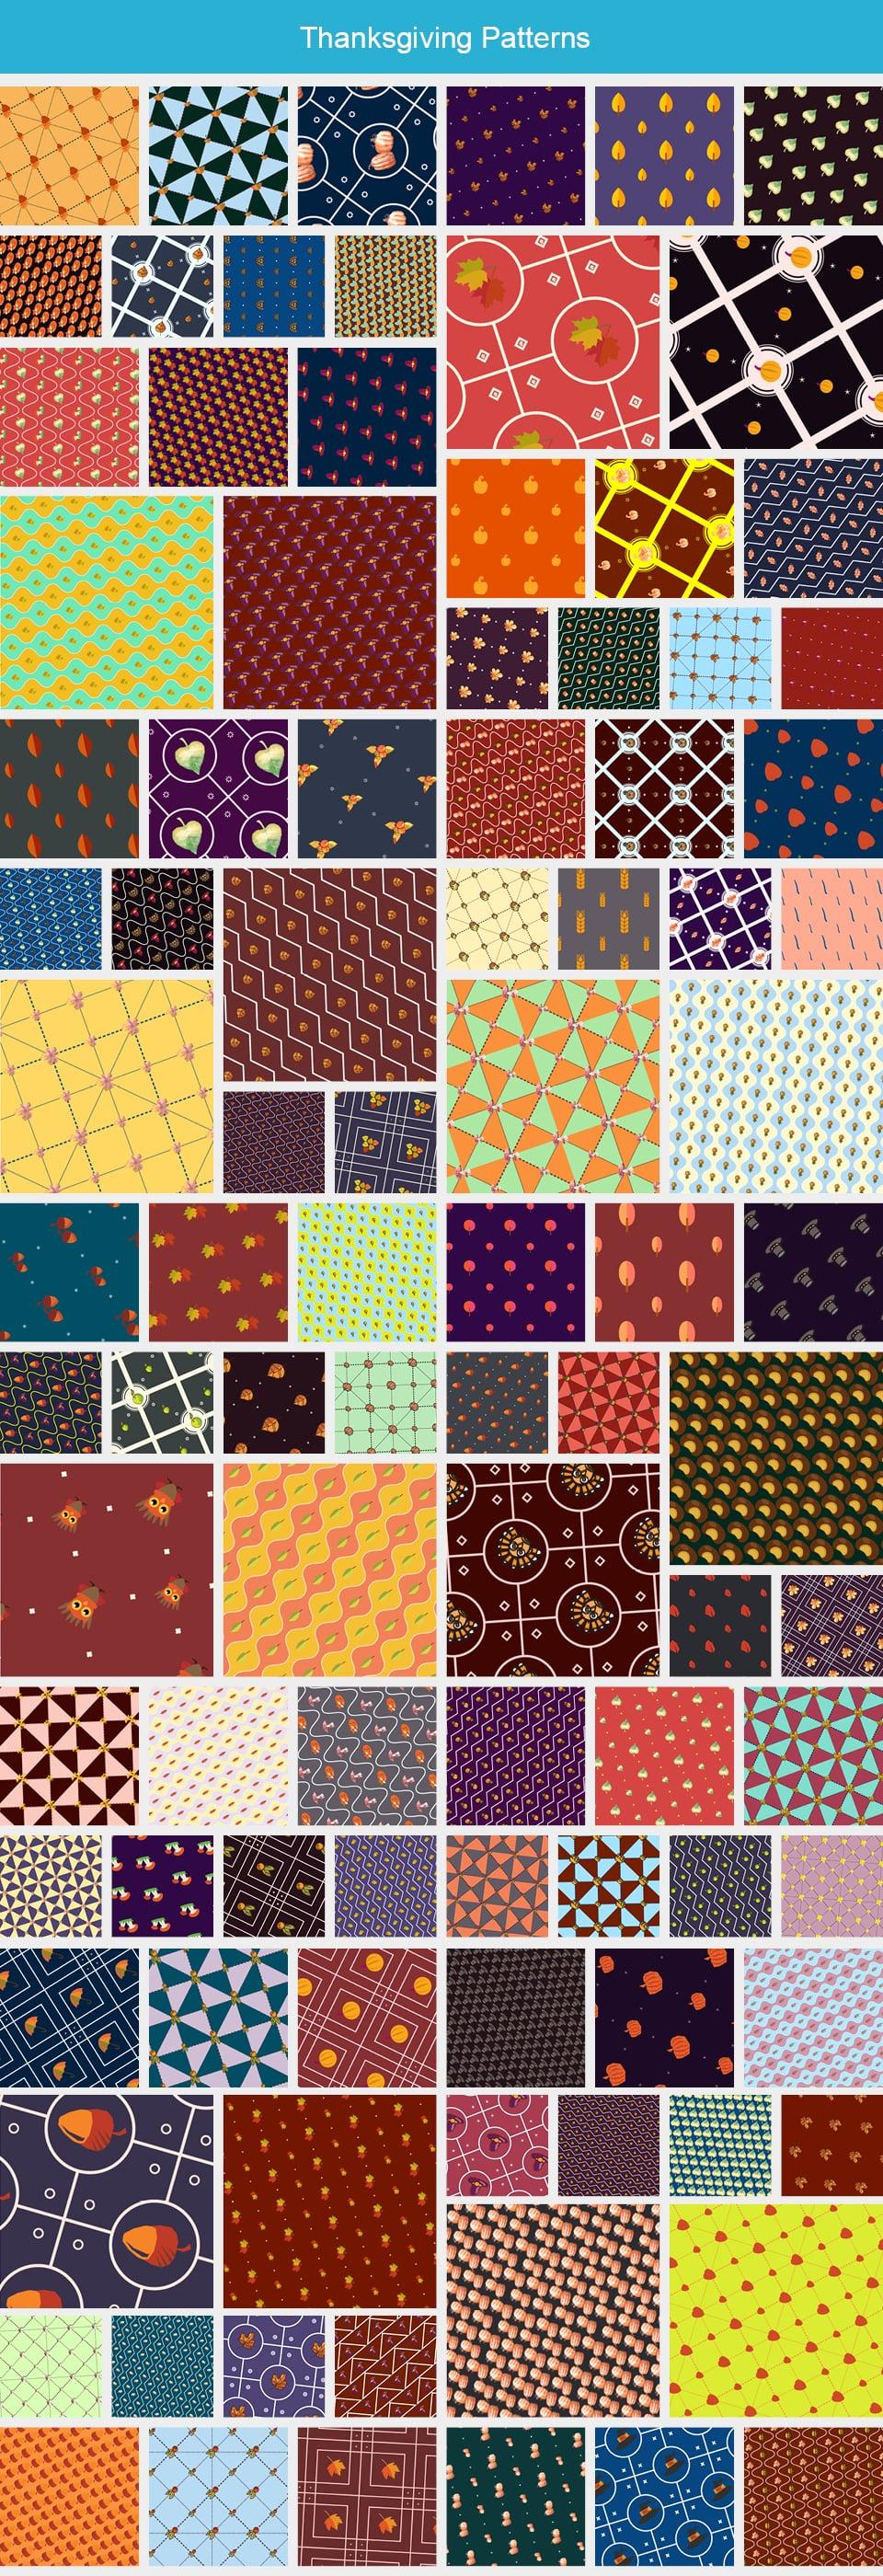 Modern Pattern Designs - Mega Bundle with 2000 Patterns - Large Preview Thanksgiving